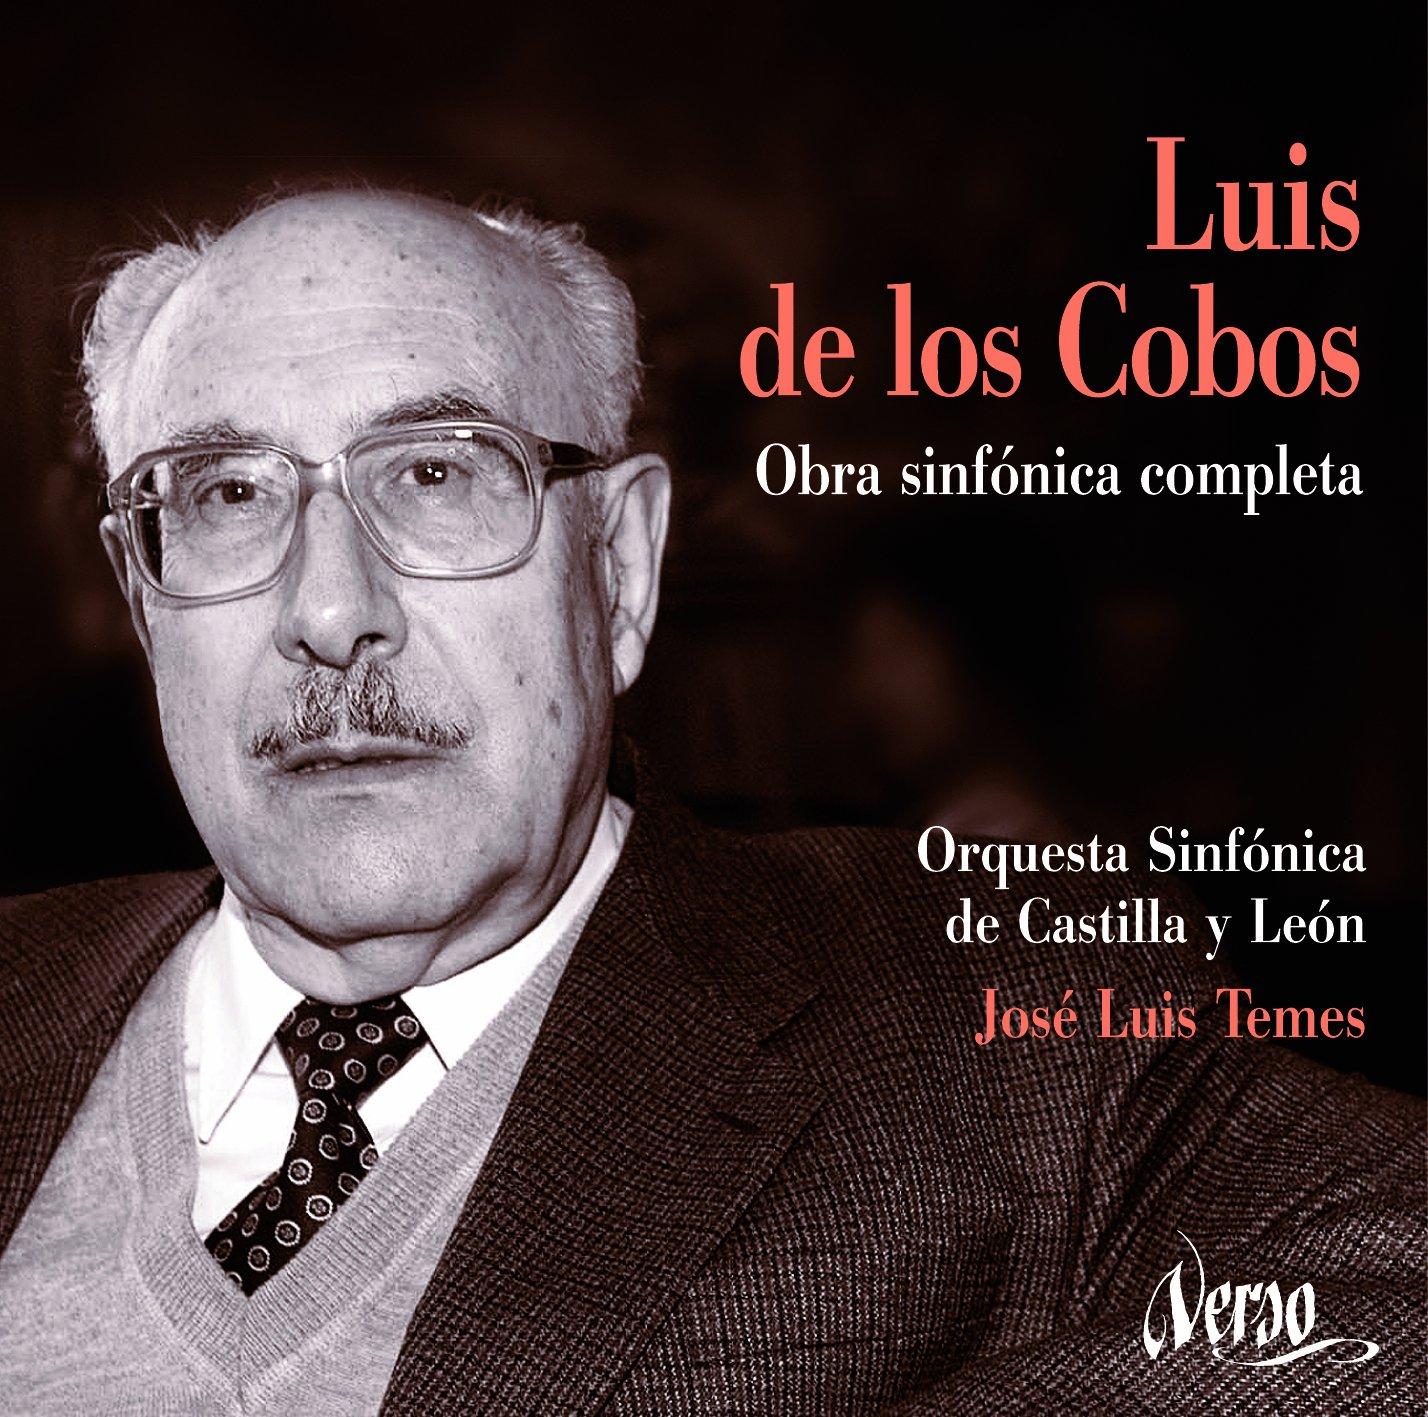 De los Cobos: Complete Orchestral Works